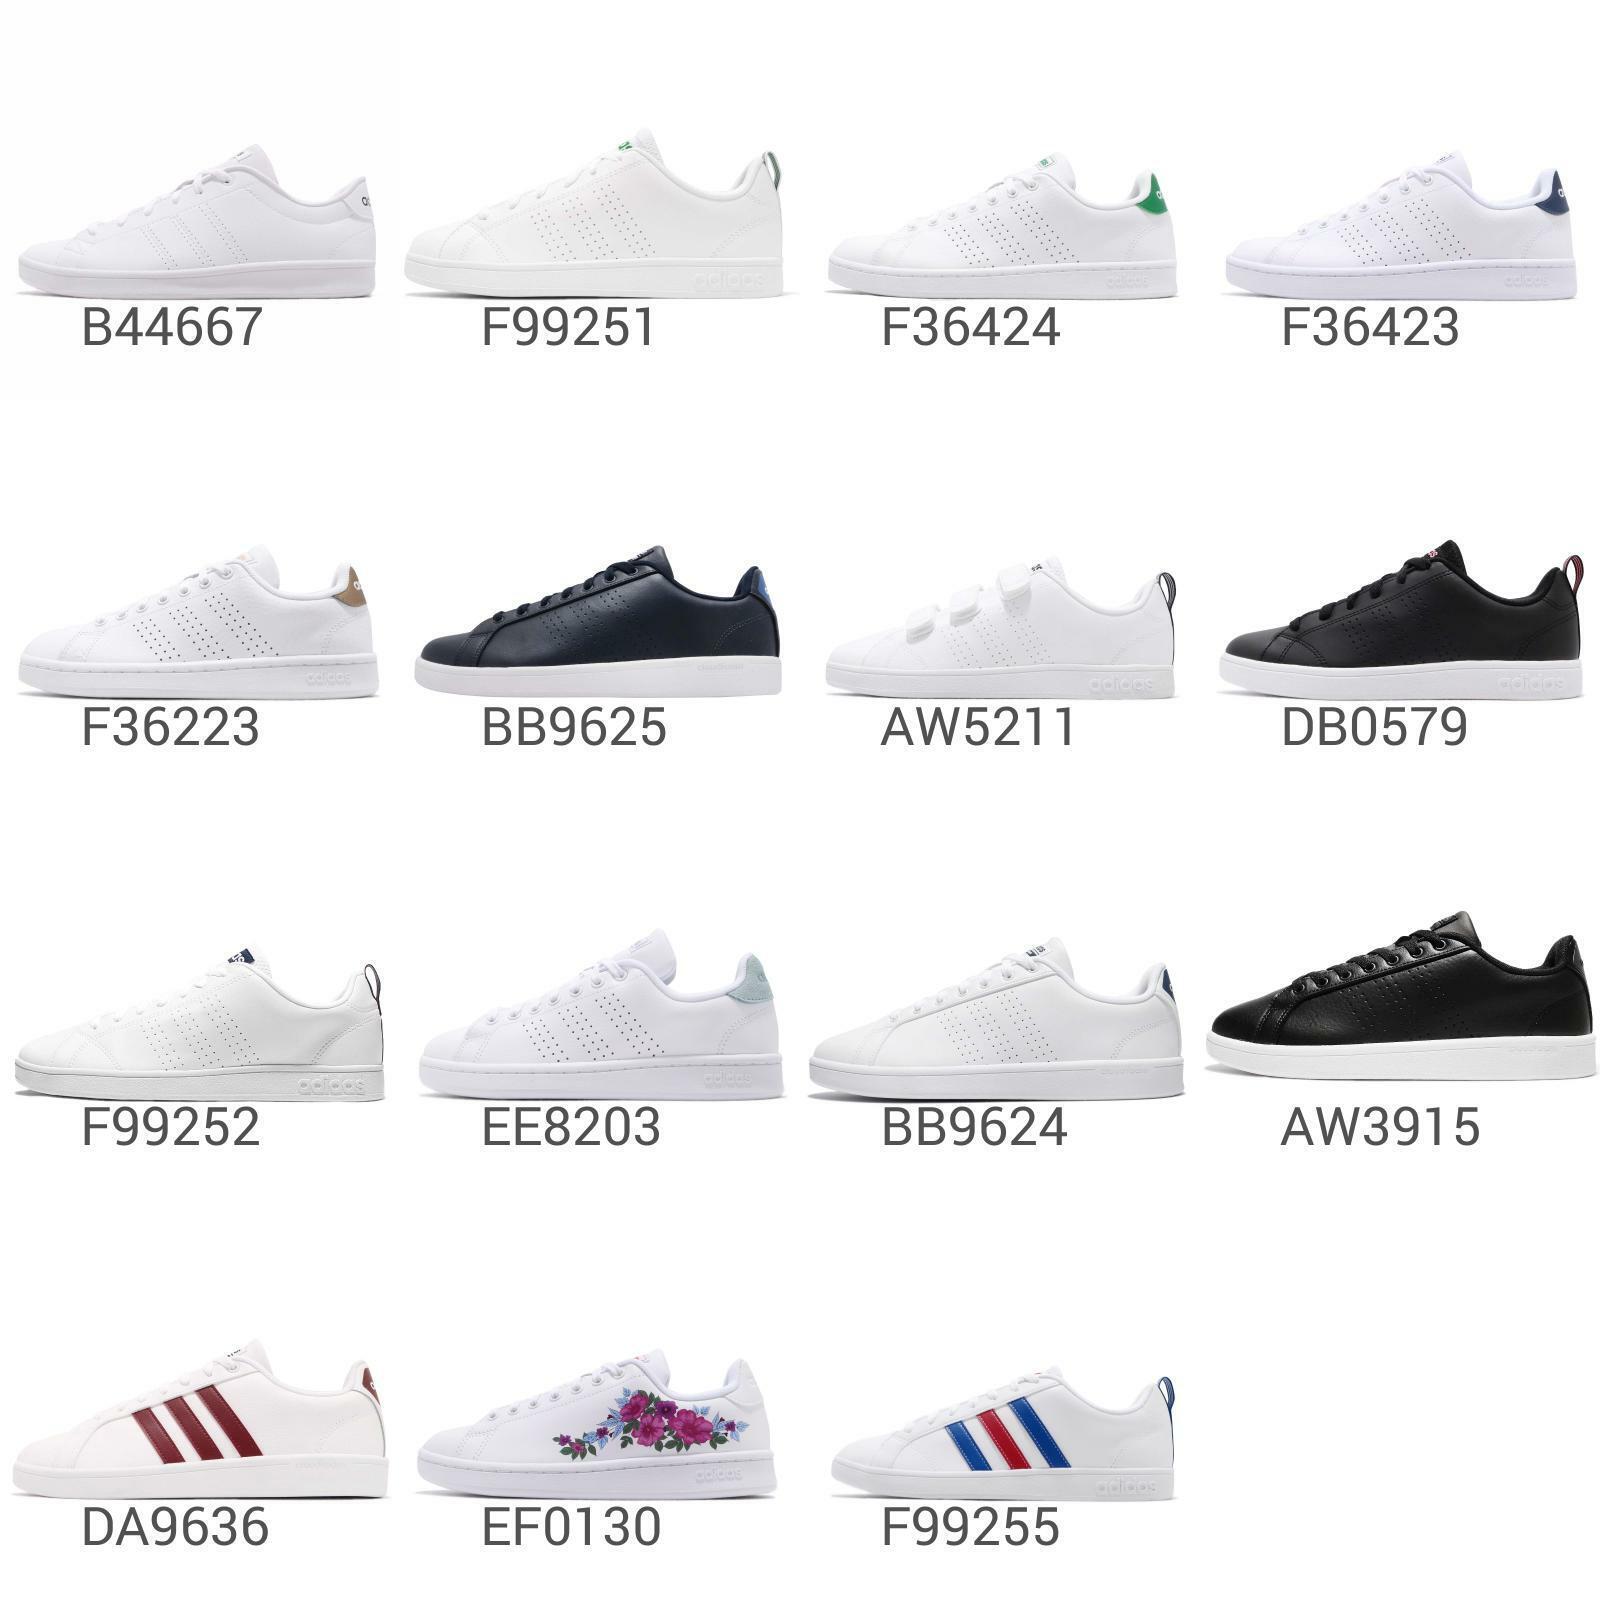 adidas Neo Advantage Clean QT VS Footwear Men Women Shoes Sneakers Pick 1